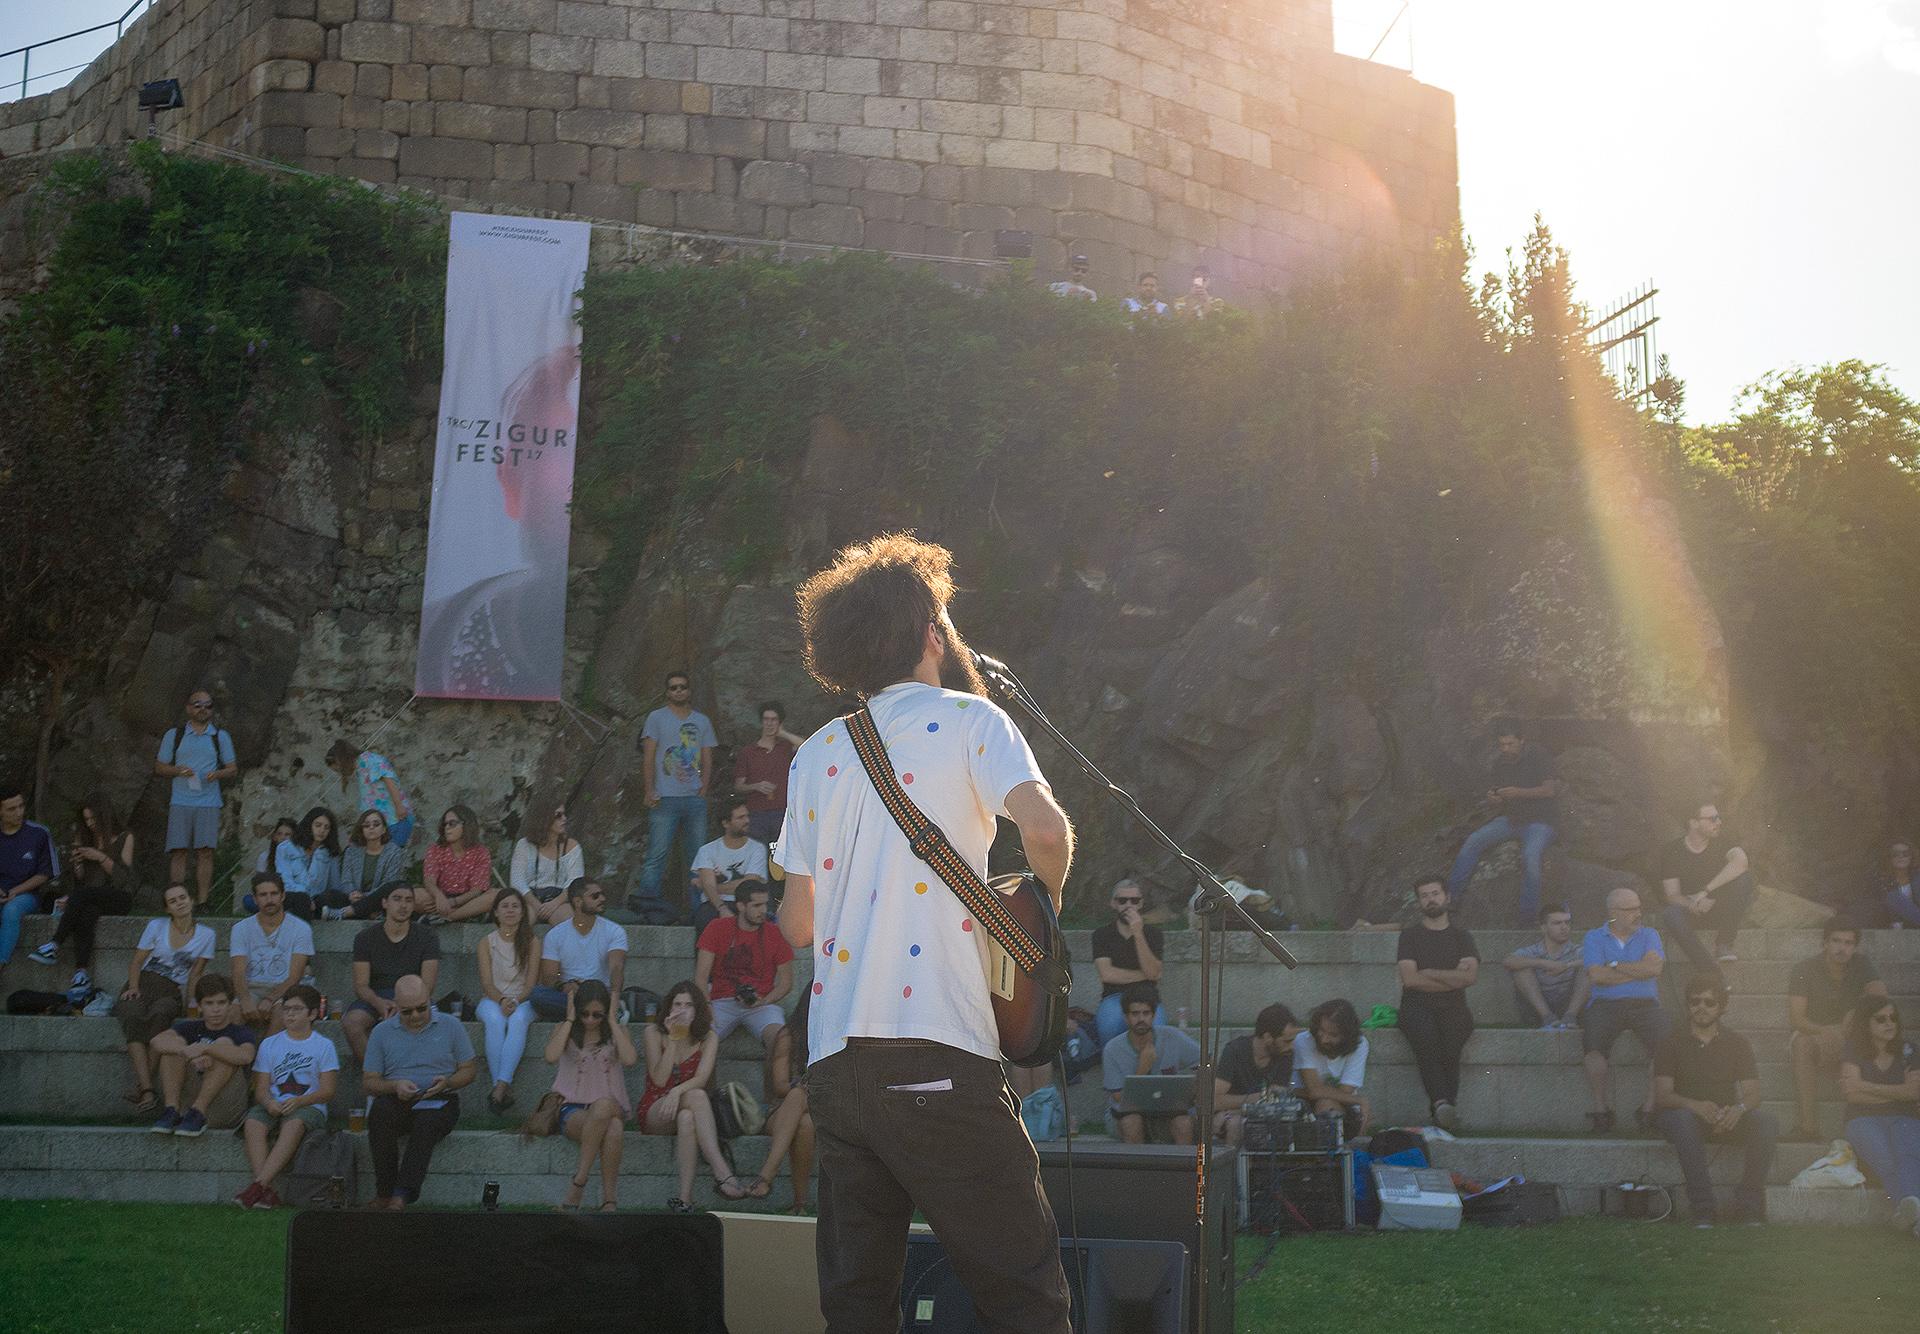 TRC Zigurfest 2017 • O Douro sublimado - Parte 1